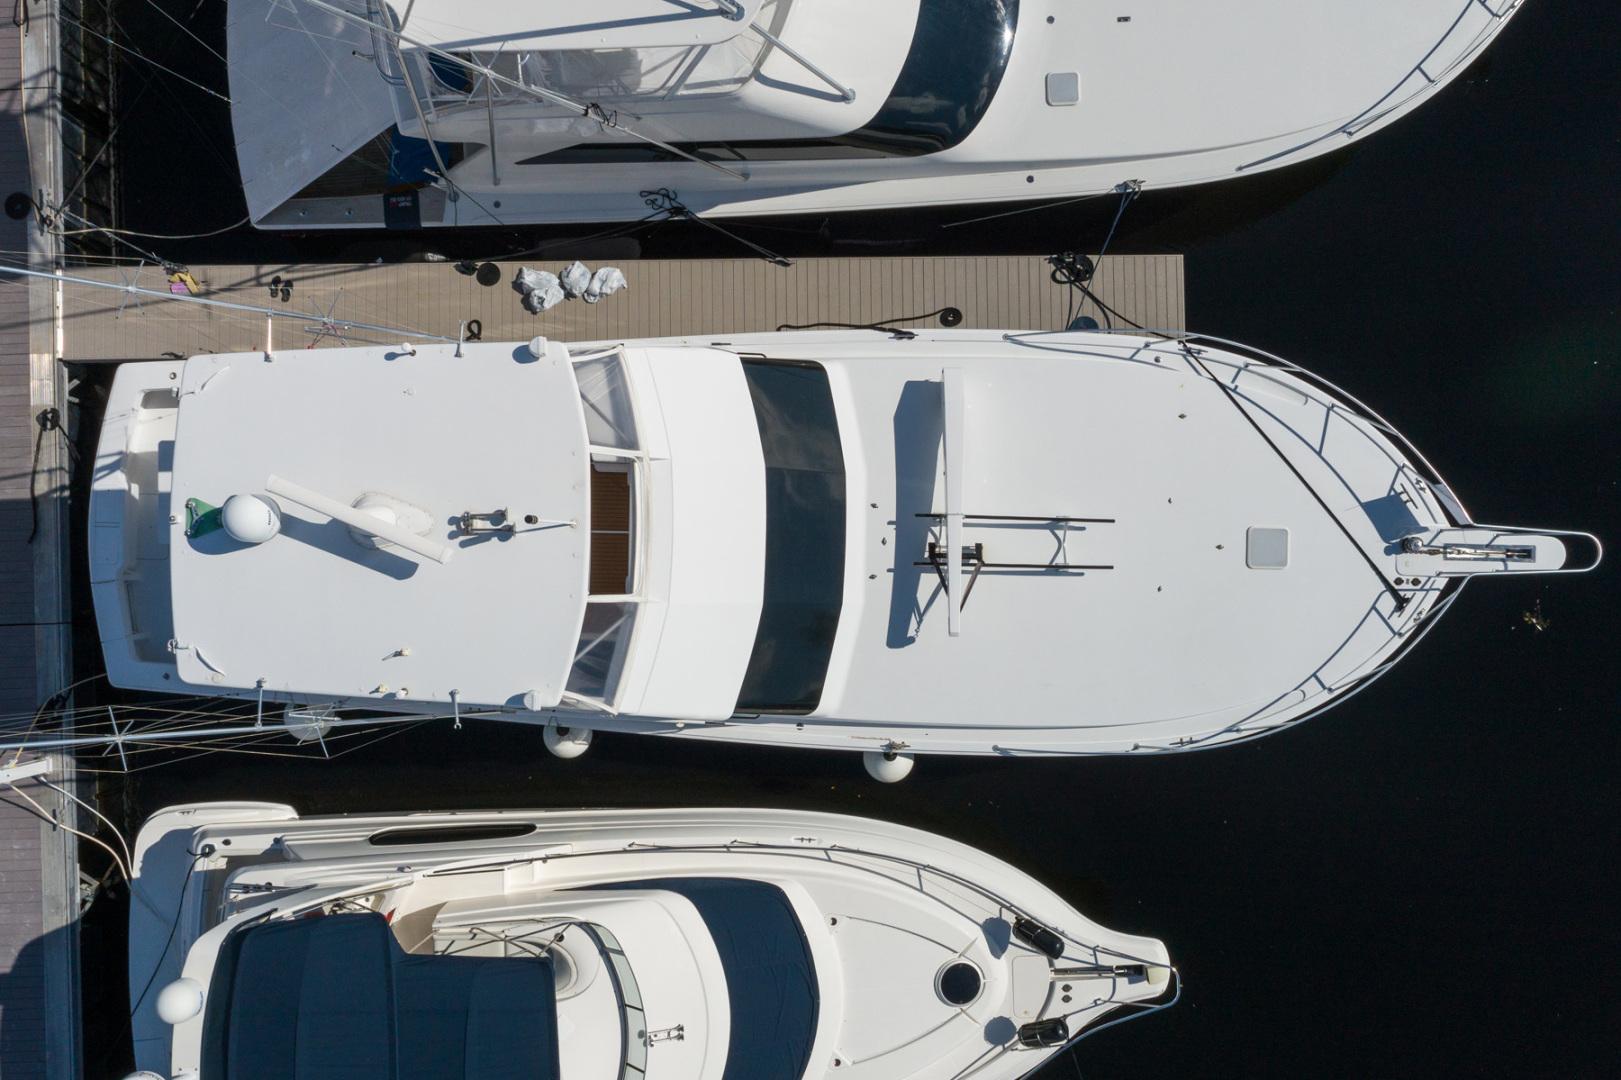 Viking-Convertible 2000-Knotty Girl Fort Lauderdale-Florida-United States-1564790   Thumbnail